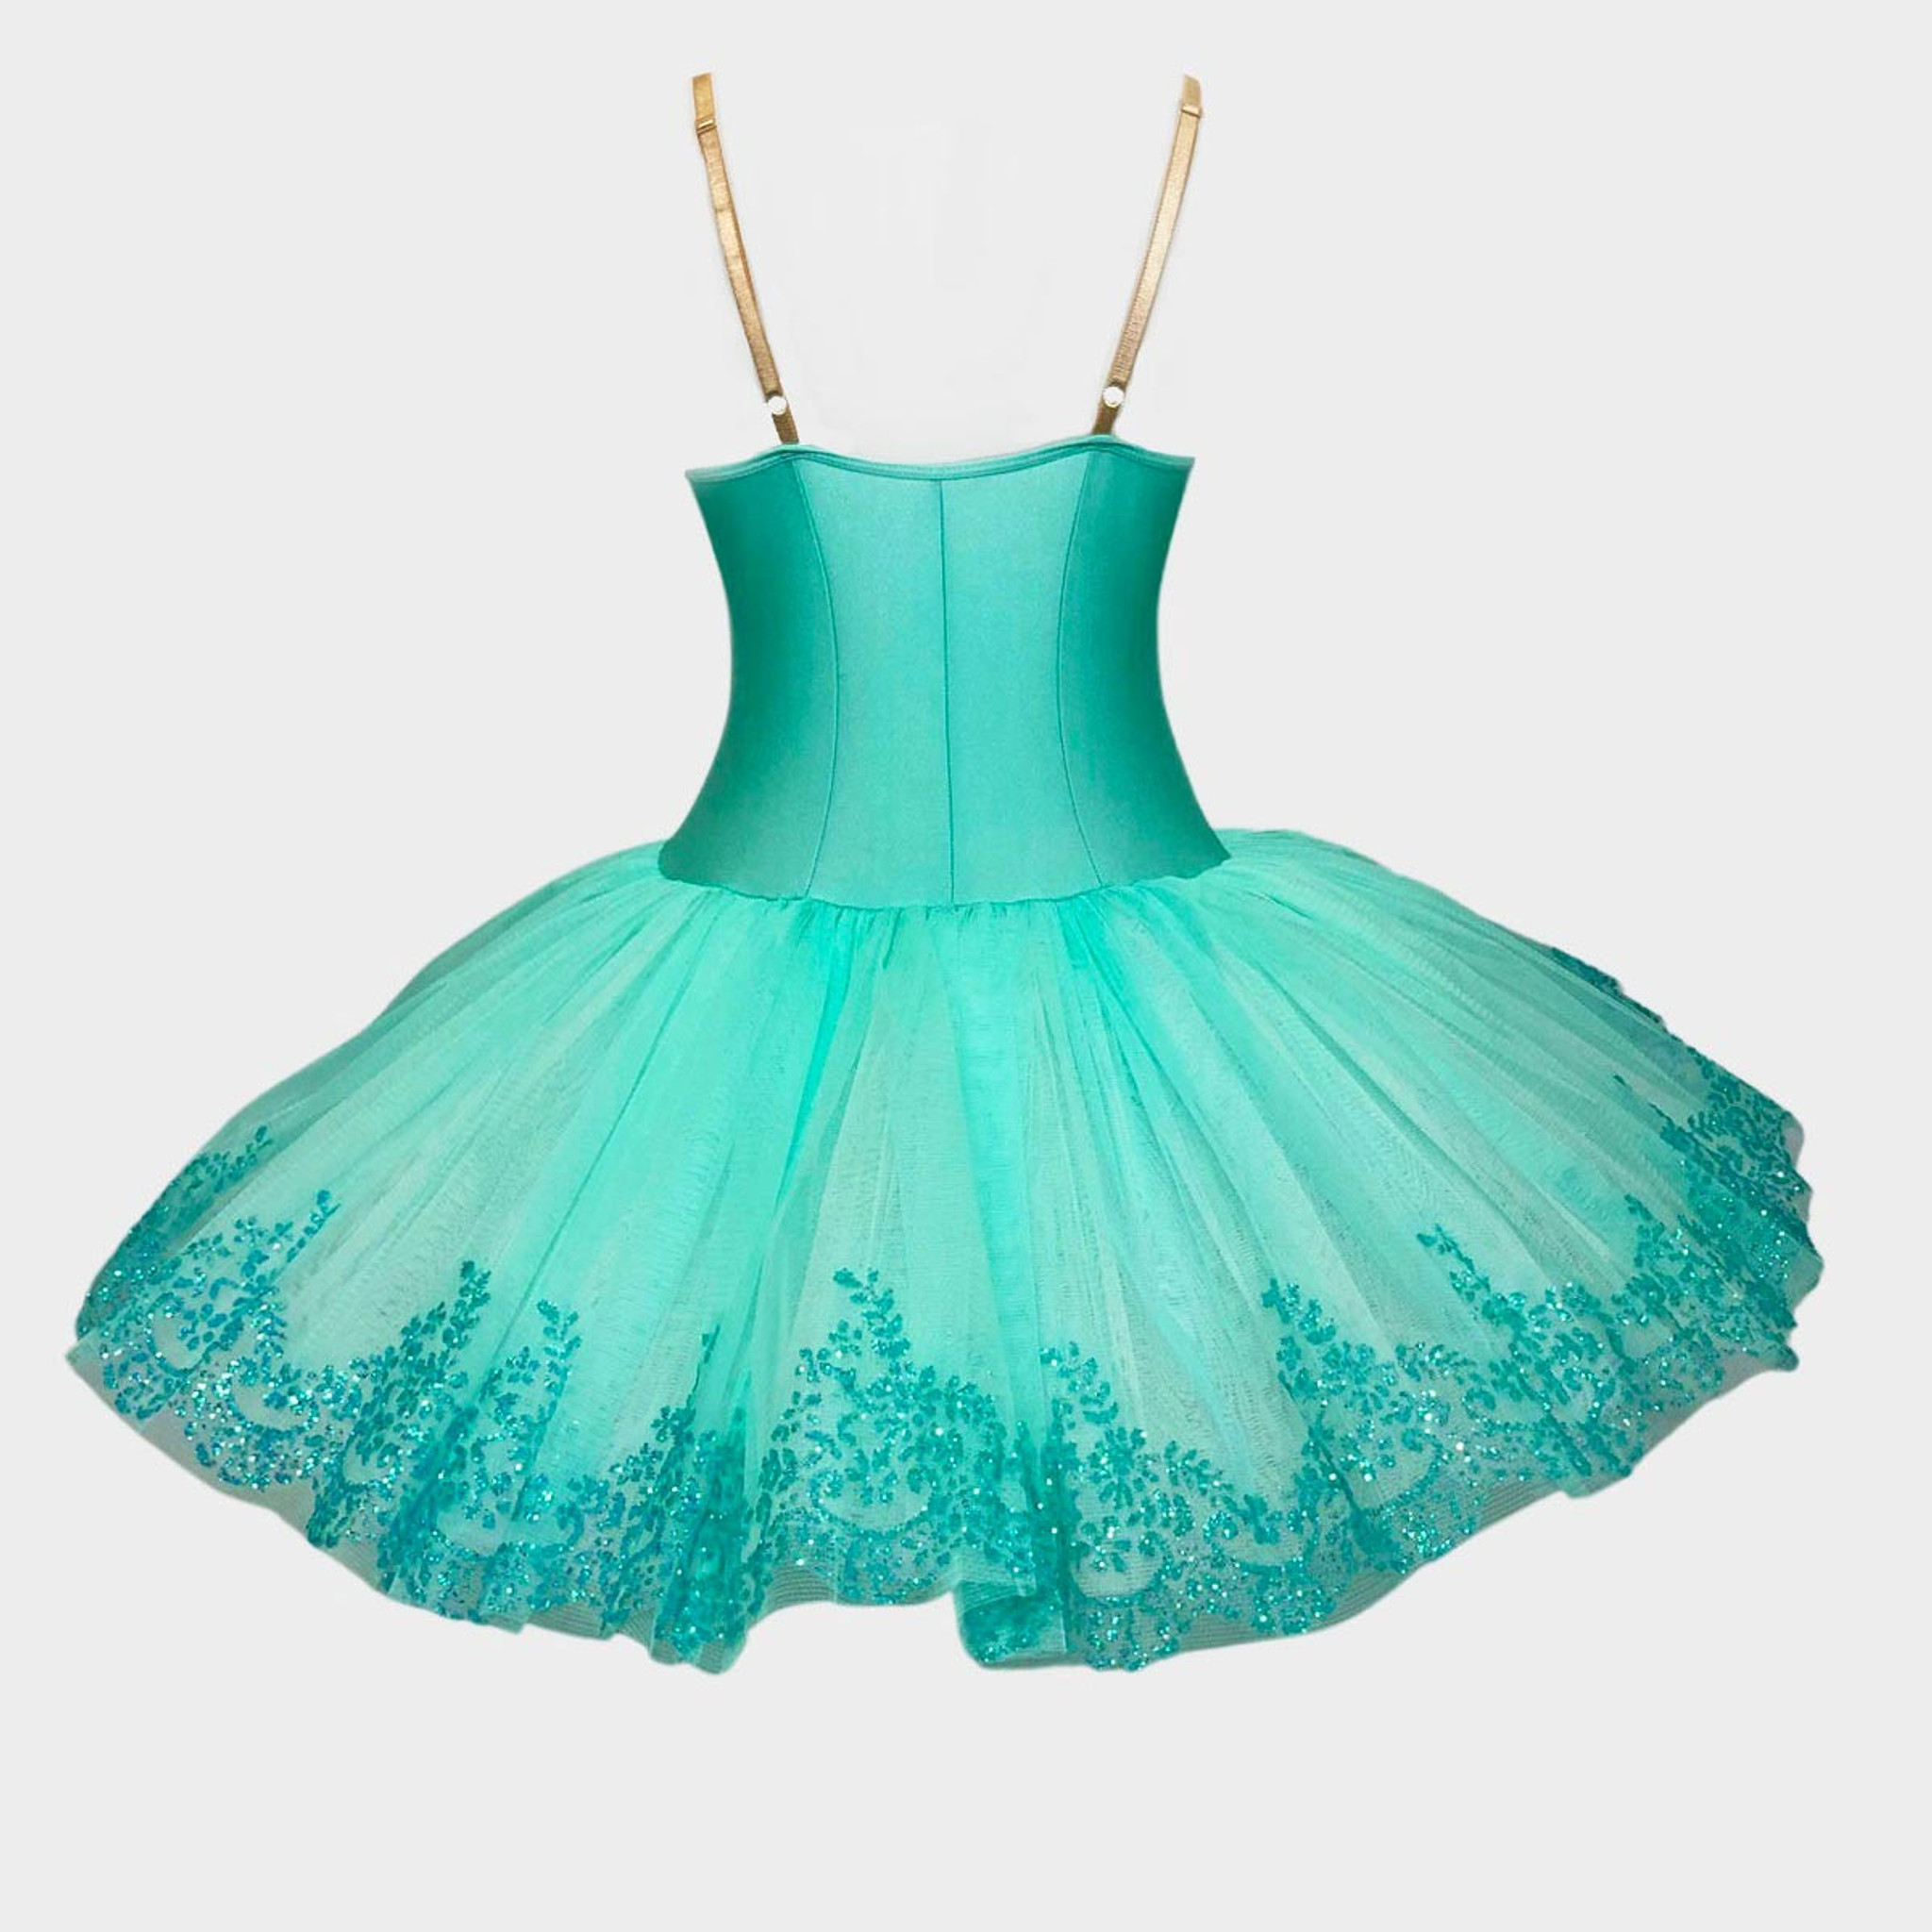 Studio 7 Dancewear Enchanting Tutu Dress for Girls